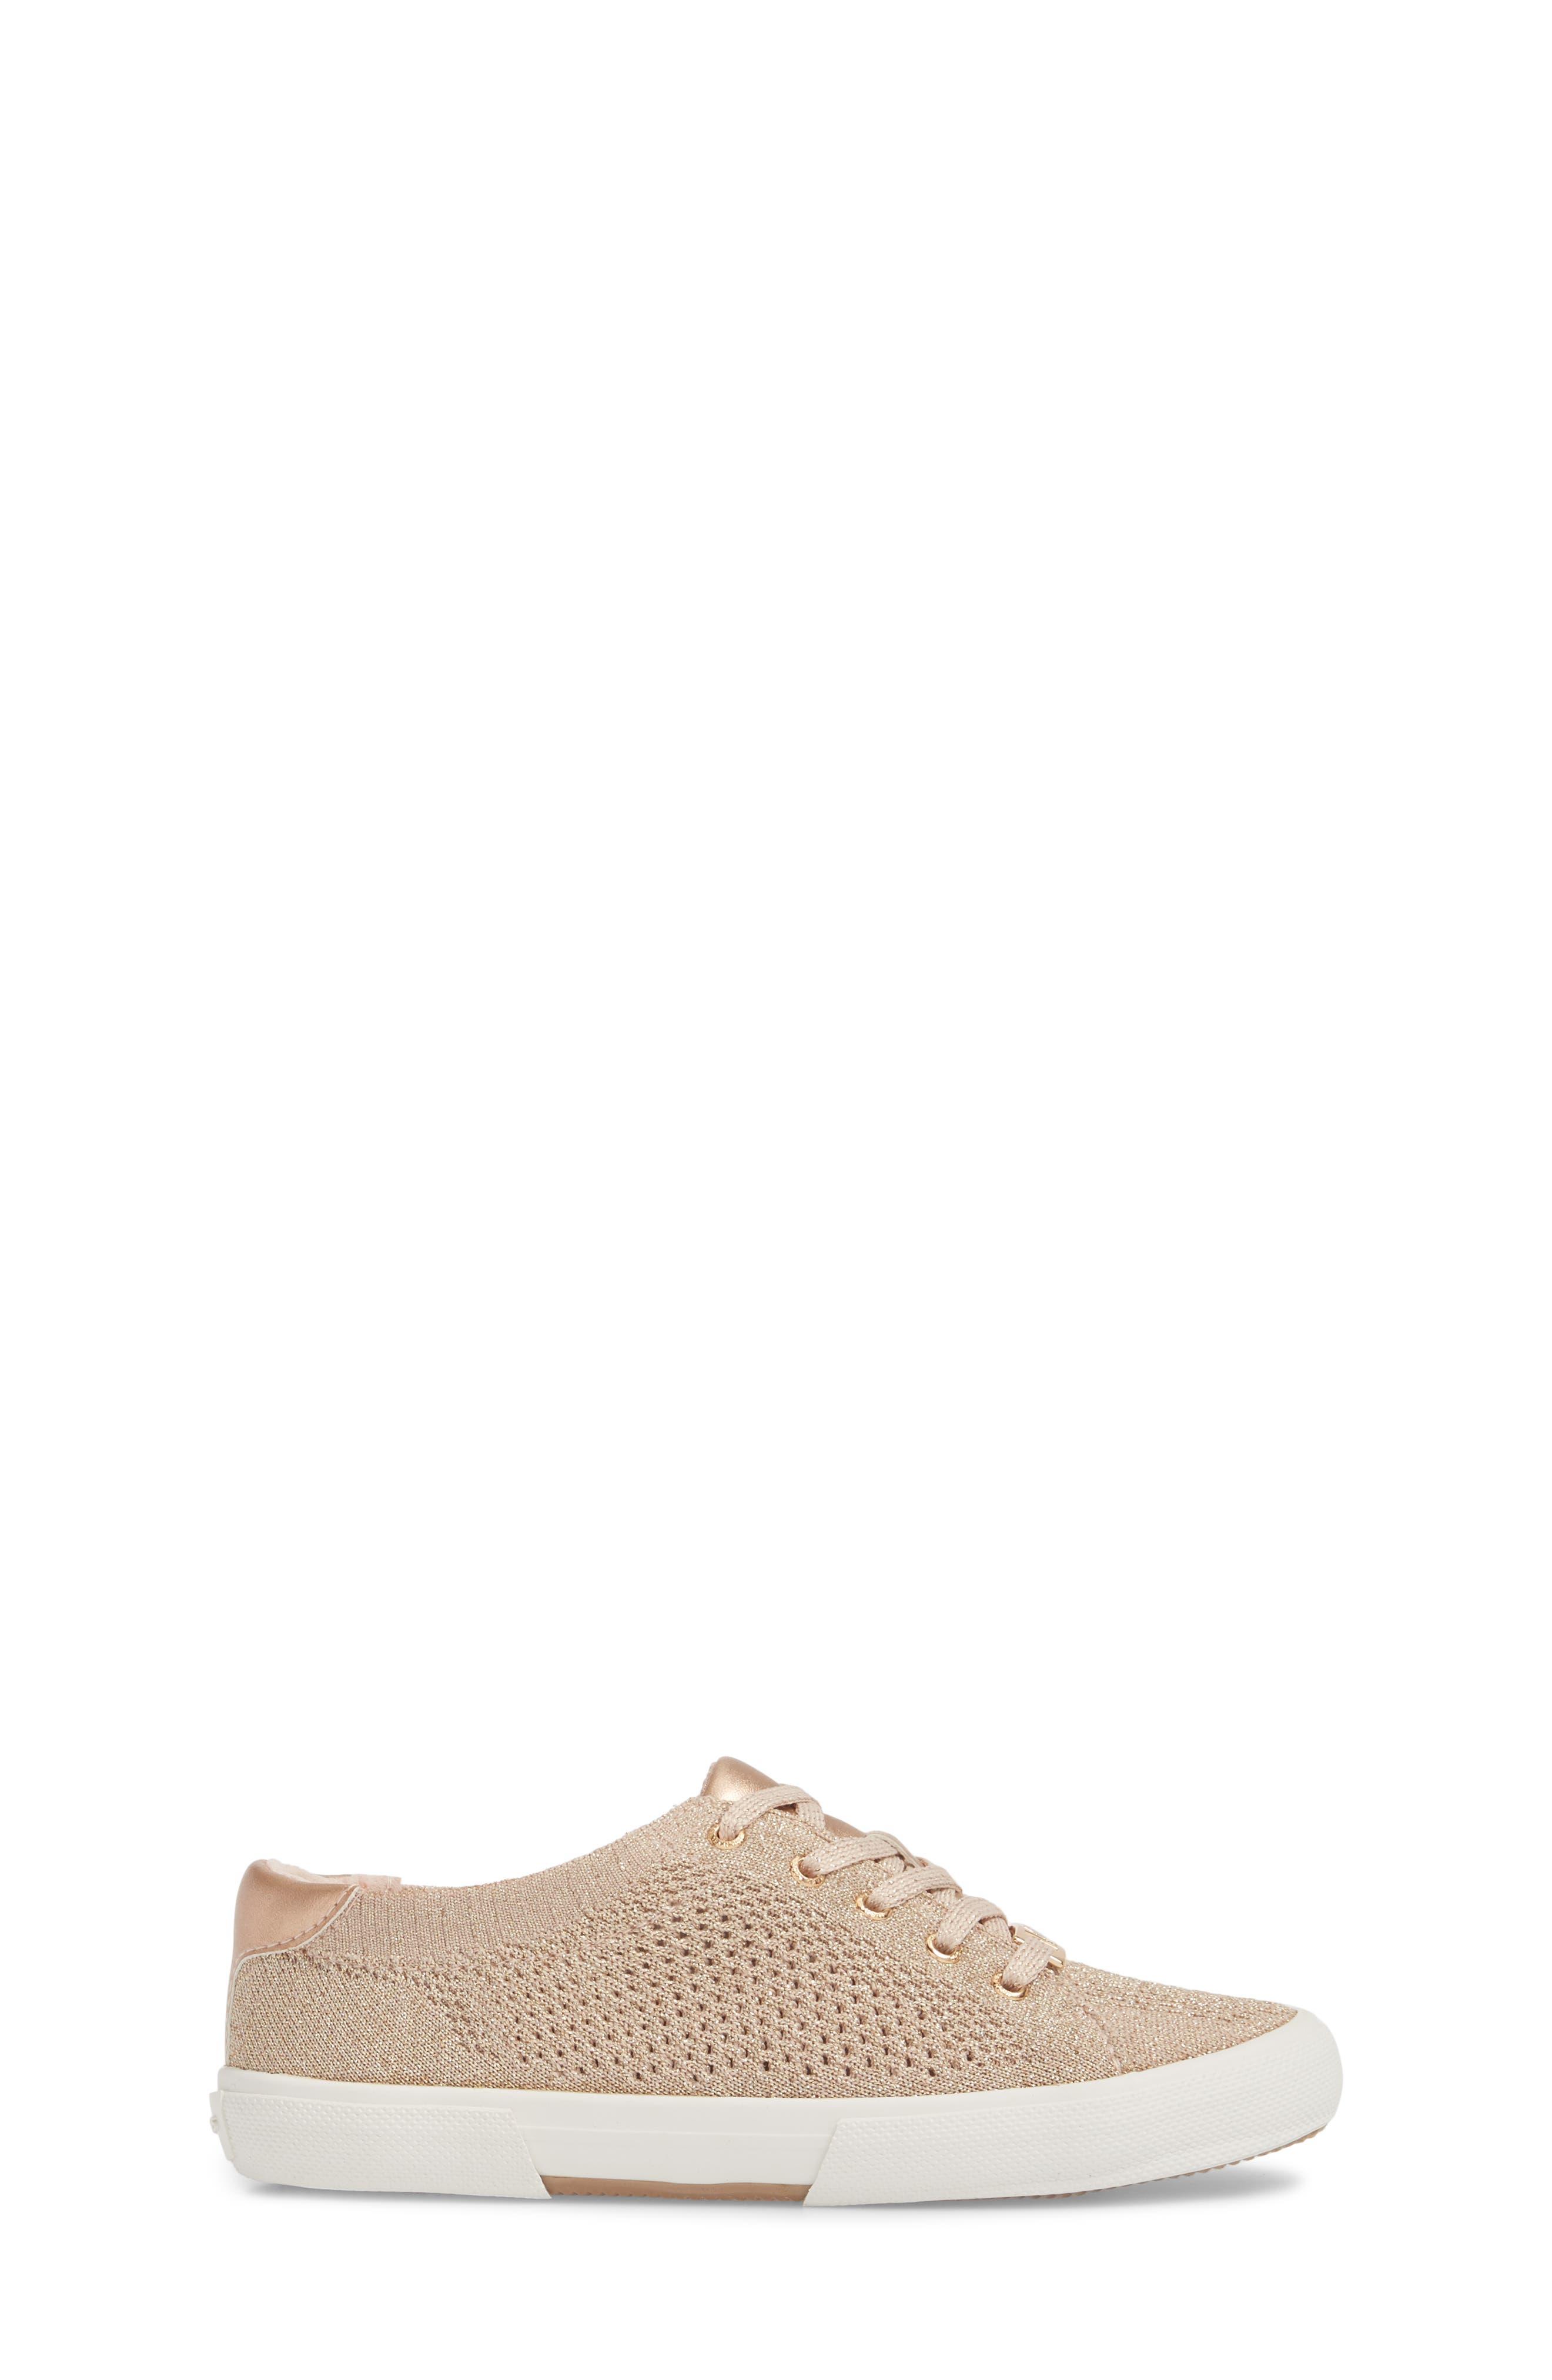 Ima Metallic Knit Sneaker,                             Alternate thumbnail 3, color,                             BLUSH SHIMMER